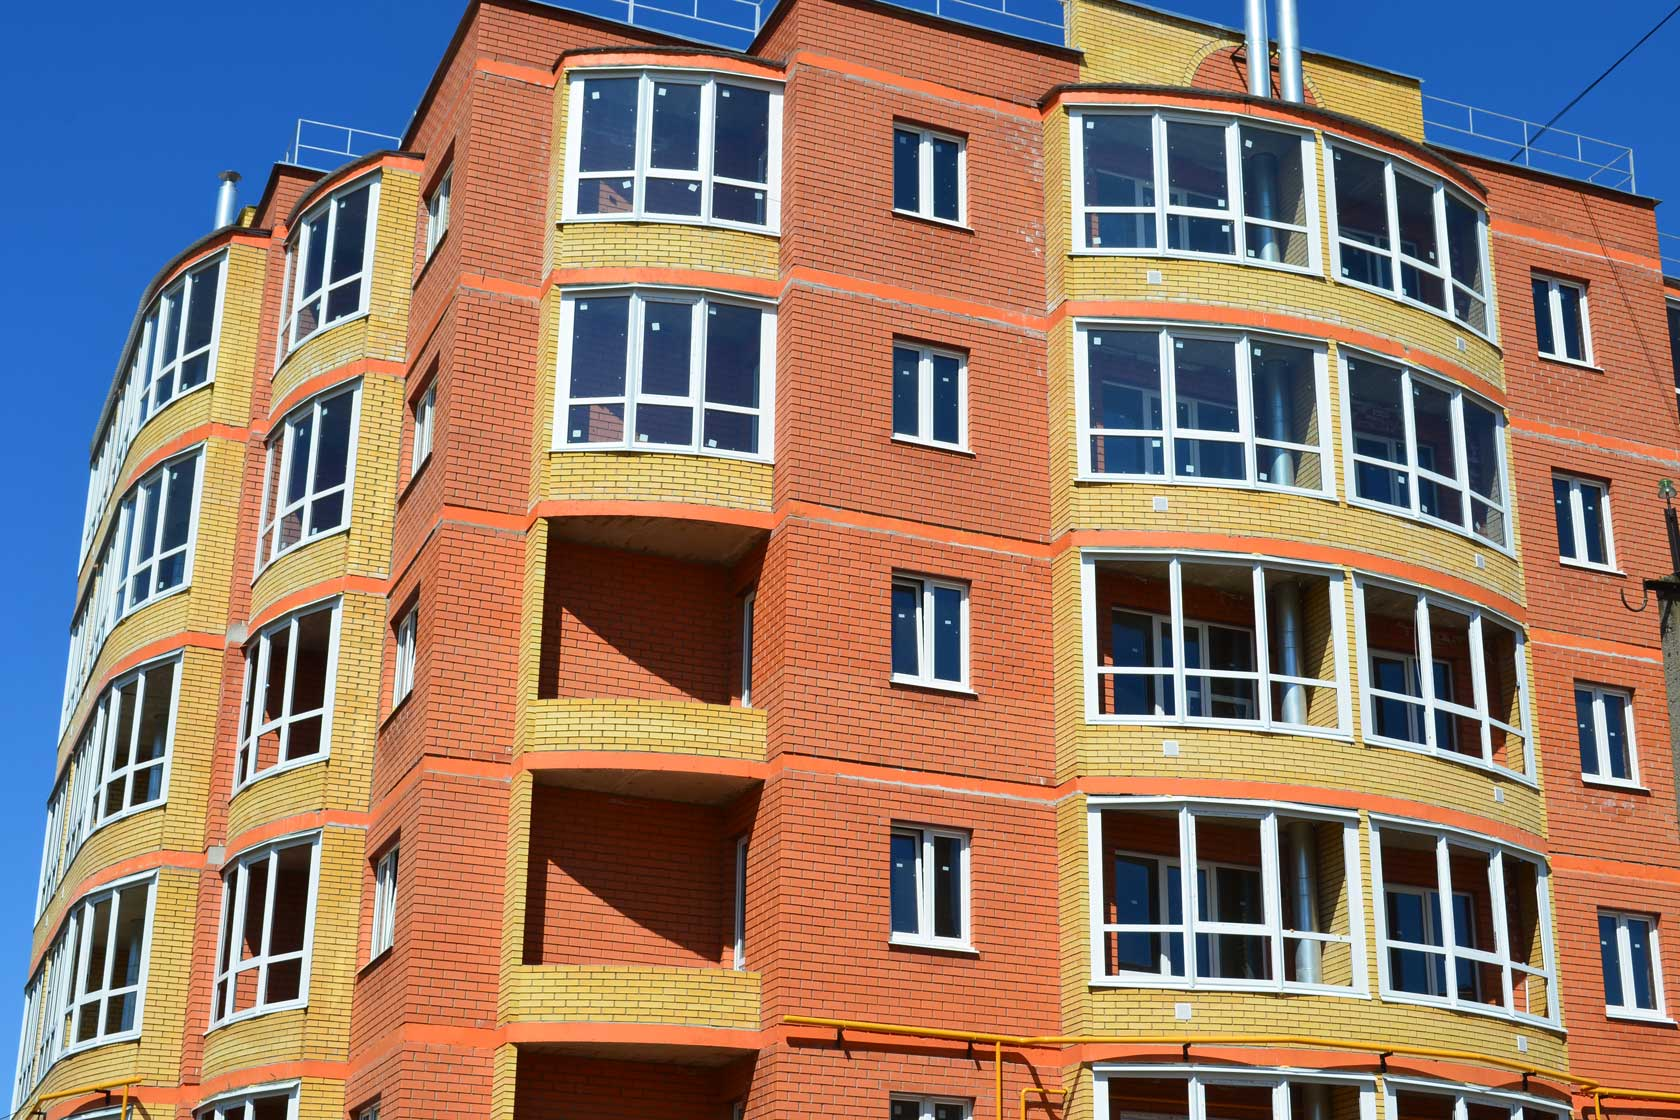 гладкова 26 чебоксары схема квартир